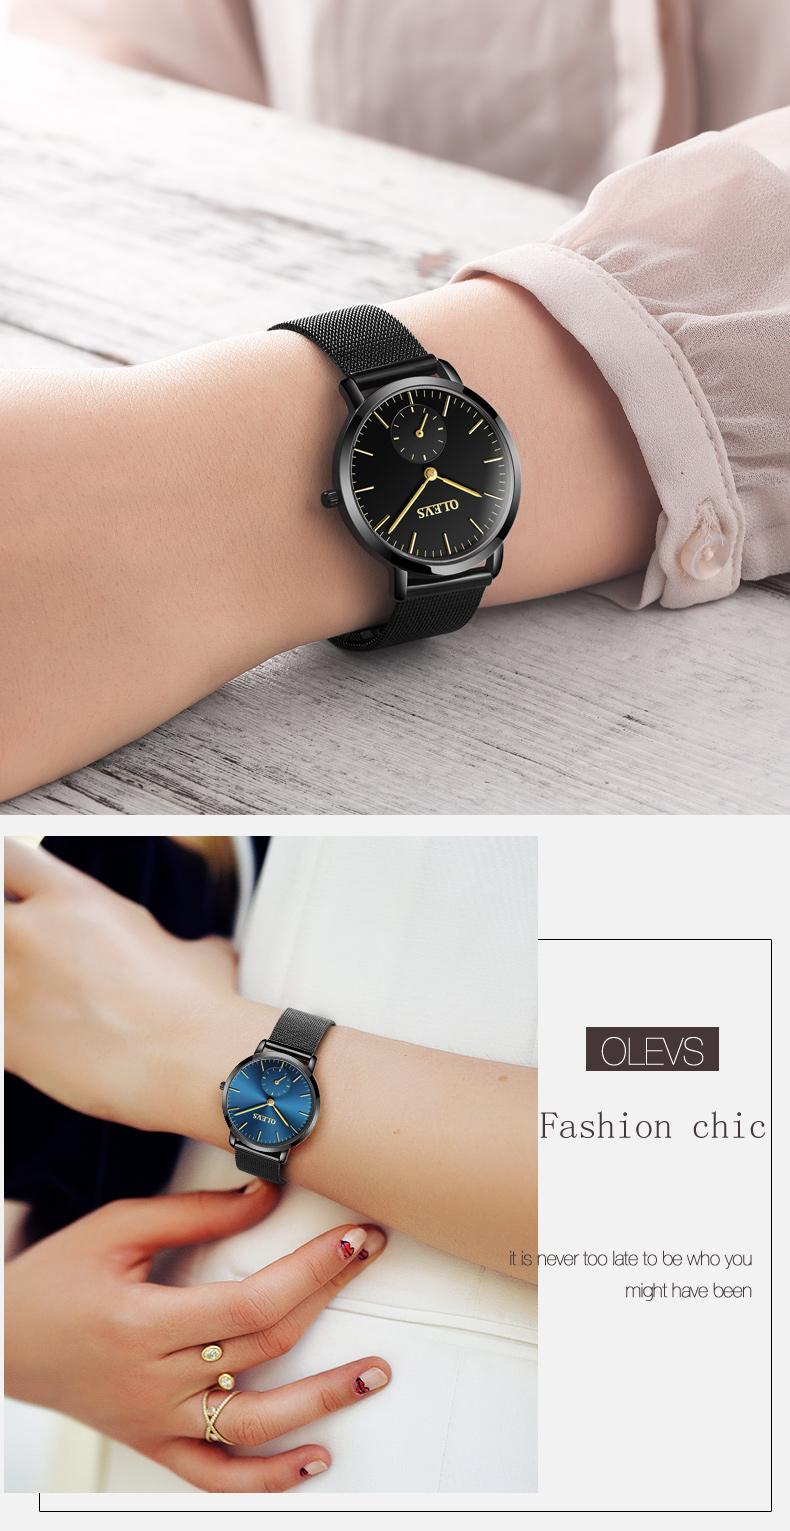 HTB1SyChSpXXXXc6XVXXq6xXFXXXB - OLEVS Luxury Watches Women's Rose Gold Casual Quartz Watch Stainless Steel Watch Water Resistant Clock relojes hombre 2017 saat